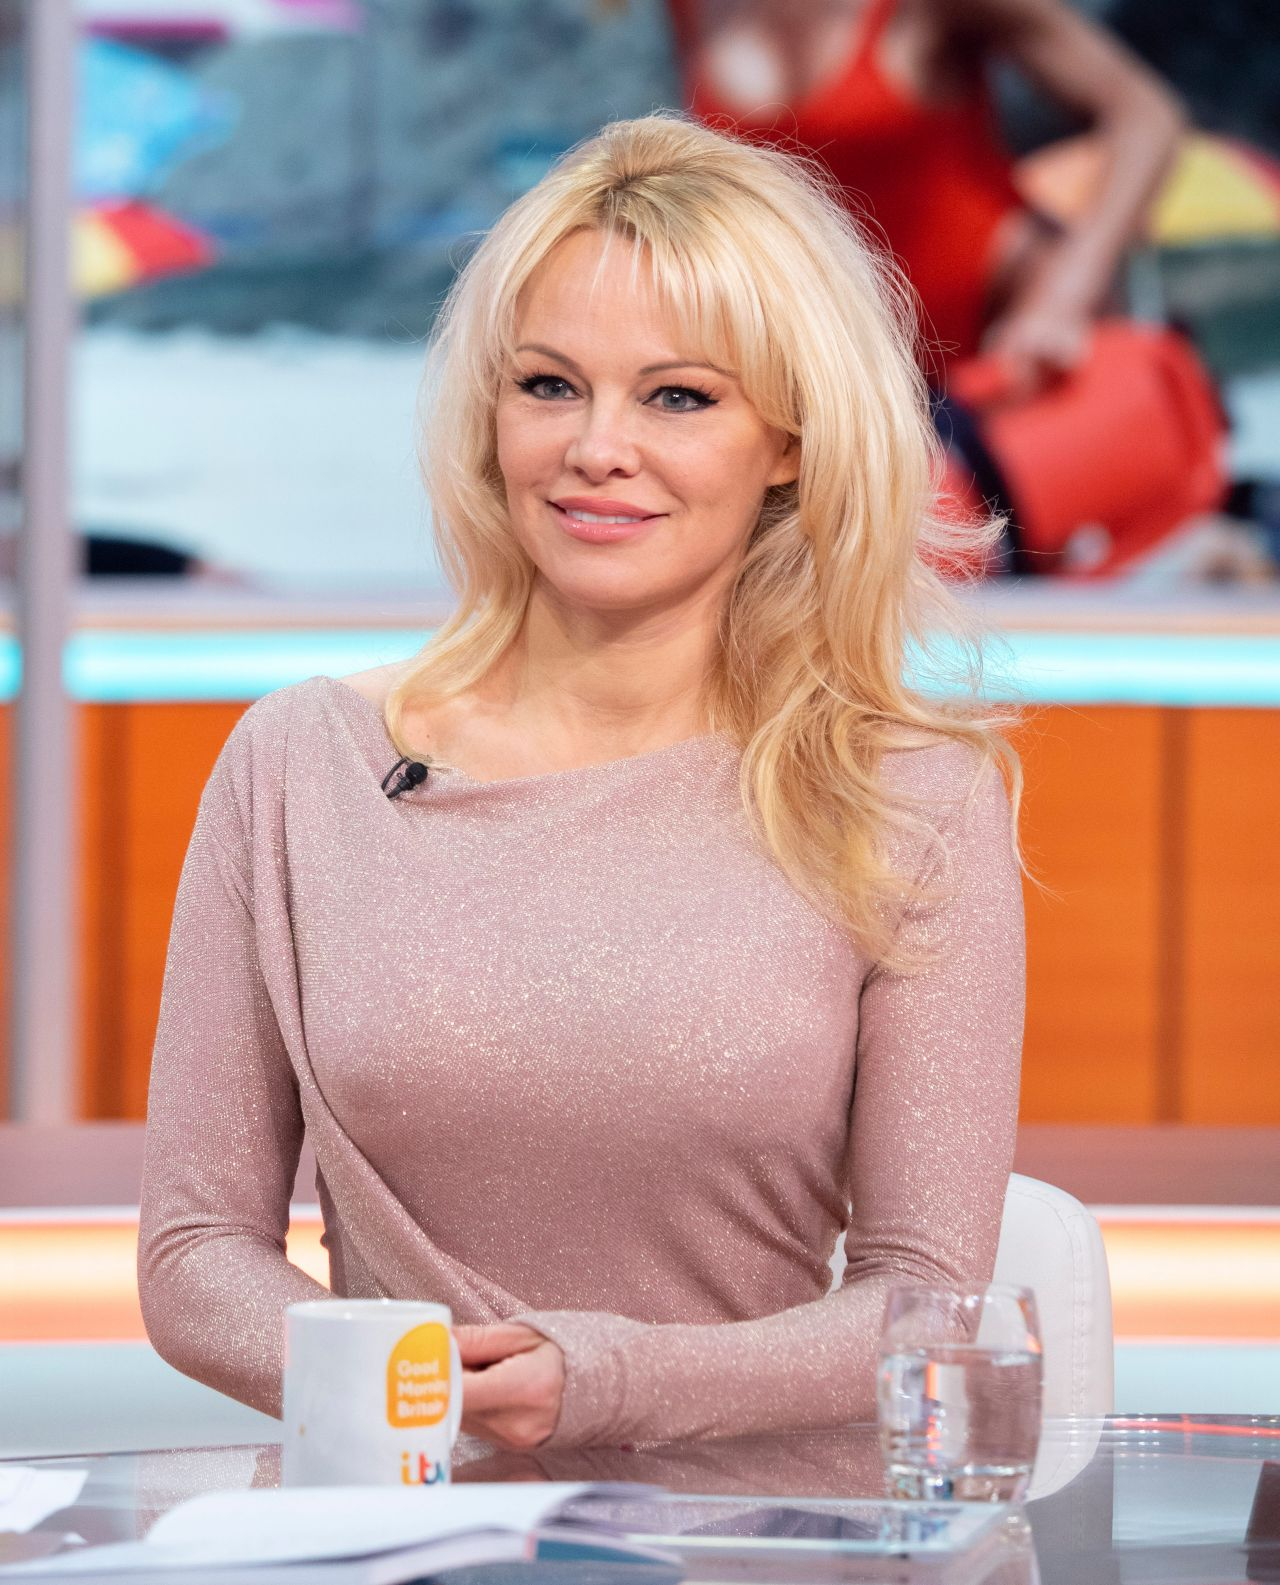 Bmwpanies Latest Models: Pamela Anderson Latest Photos